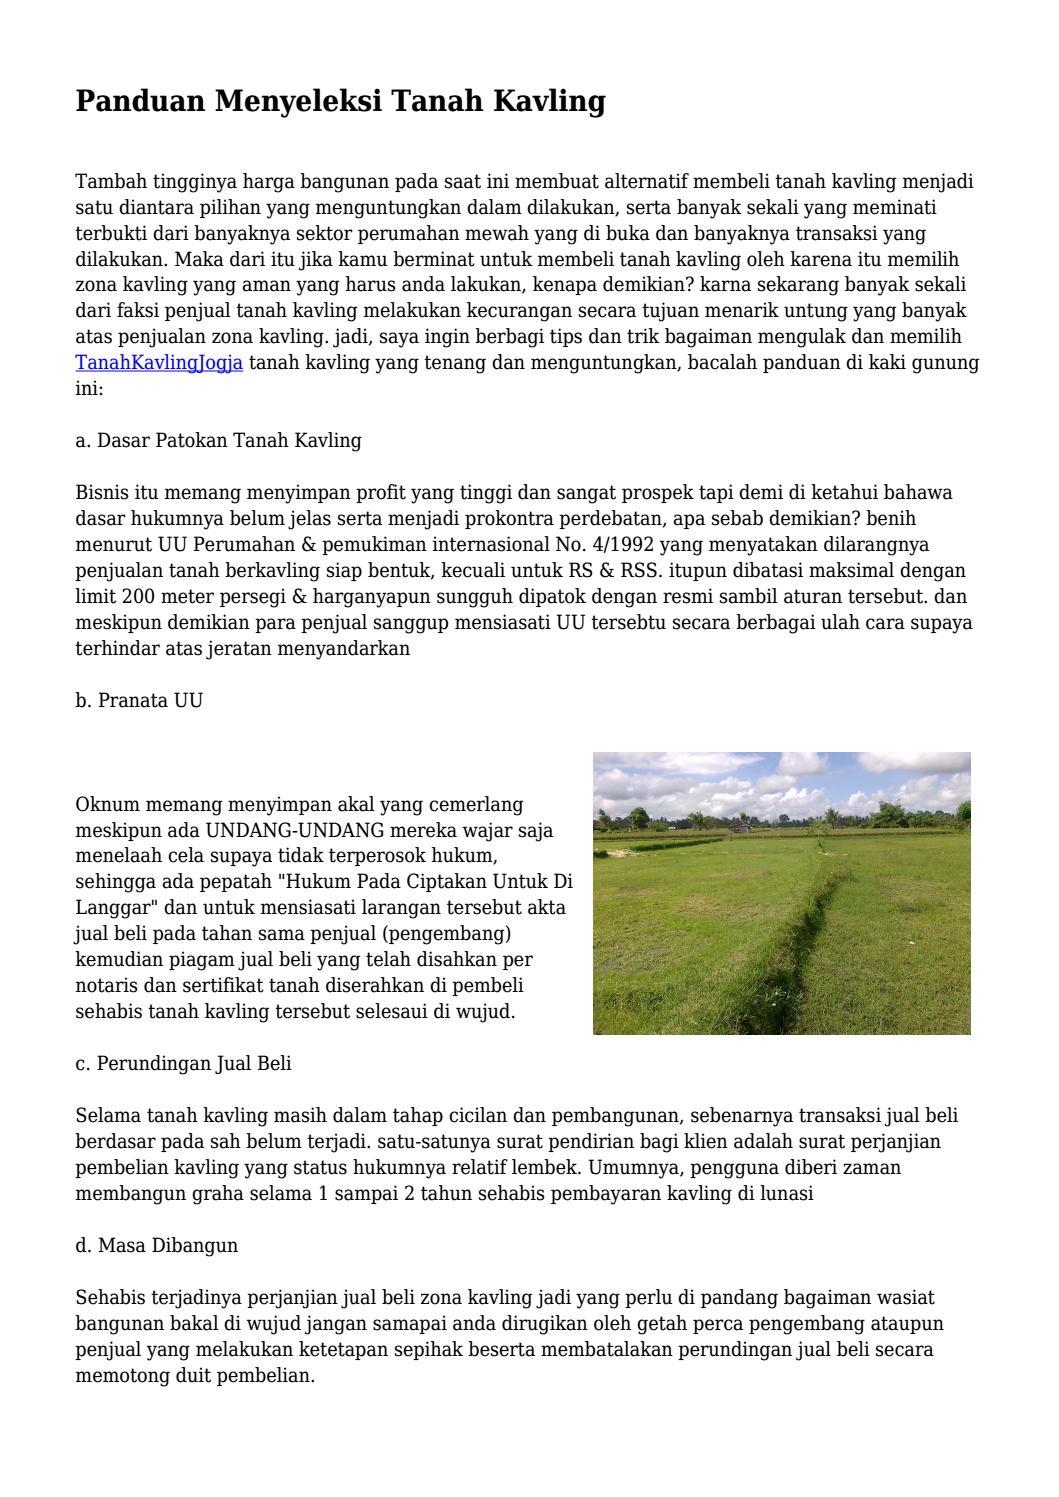 Panduan Menyeleksi Tanah Kavling By Taggayahiduppusat Issuu